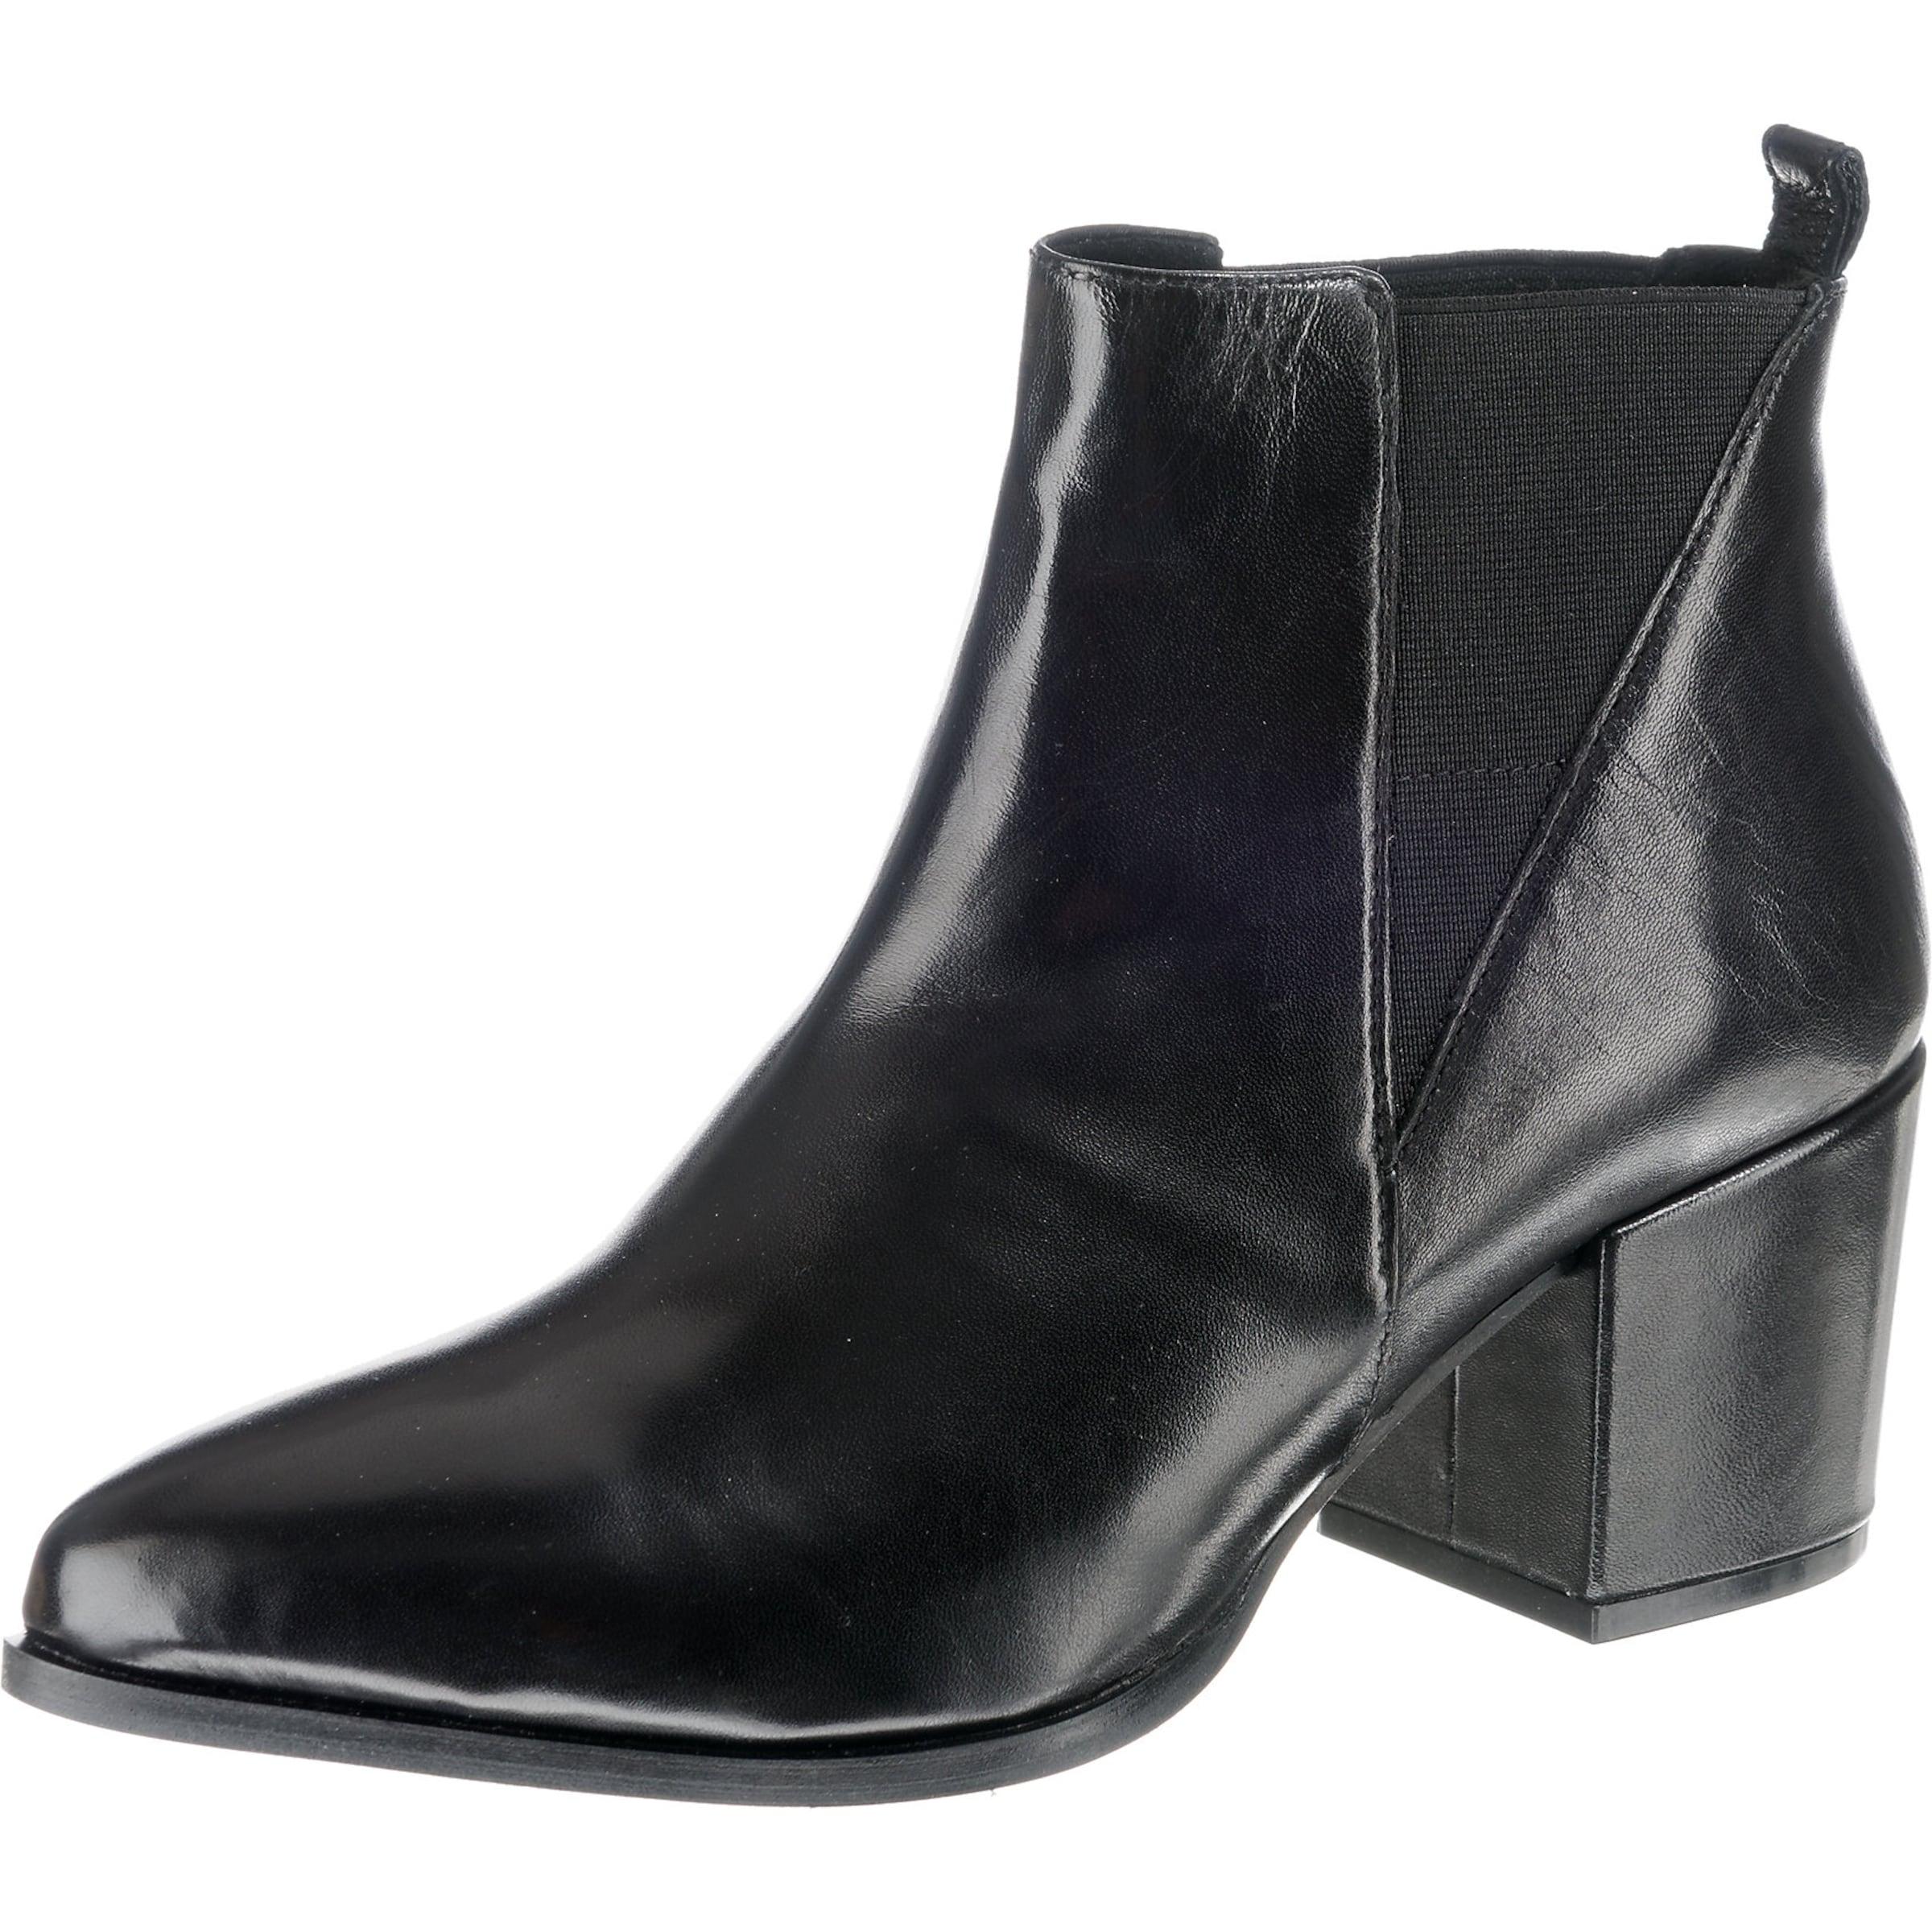 Schwarz In Boot 'nelsea' Boot Spm 'nelsea' Spm In HED29WIY